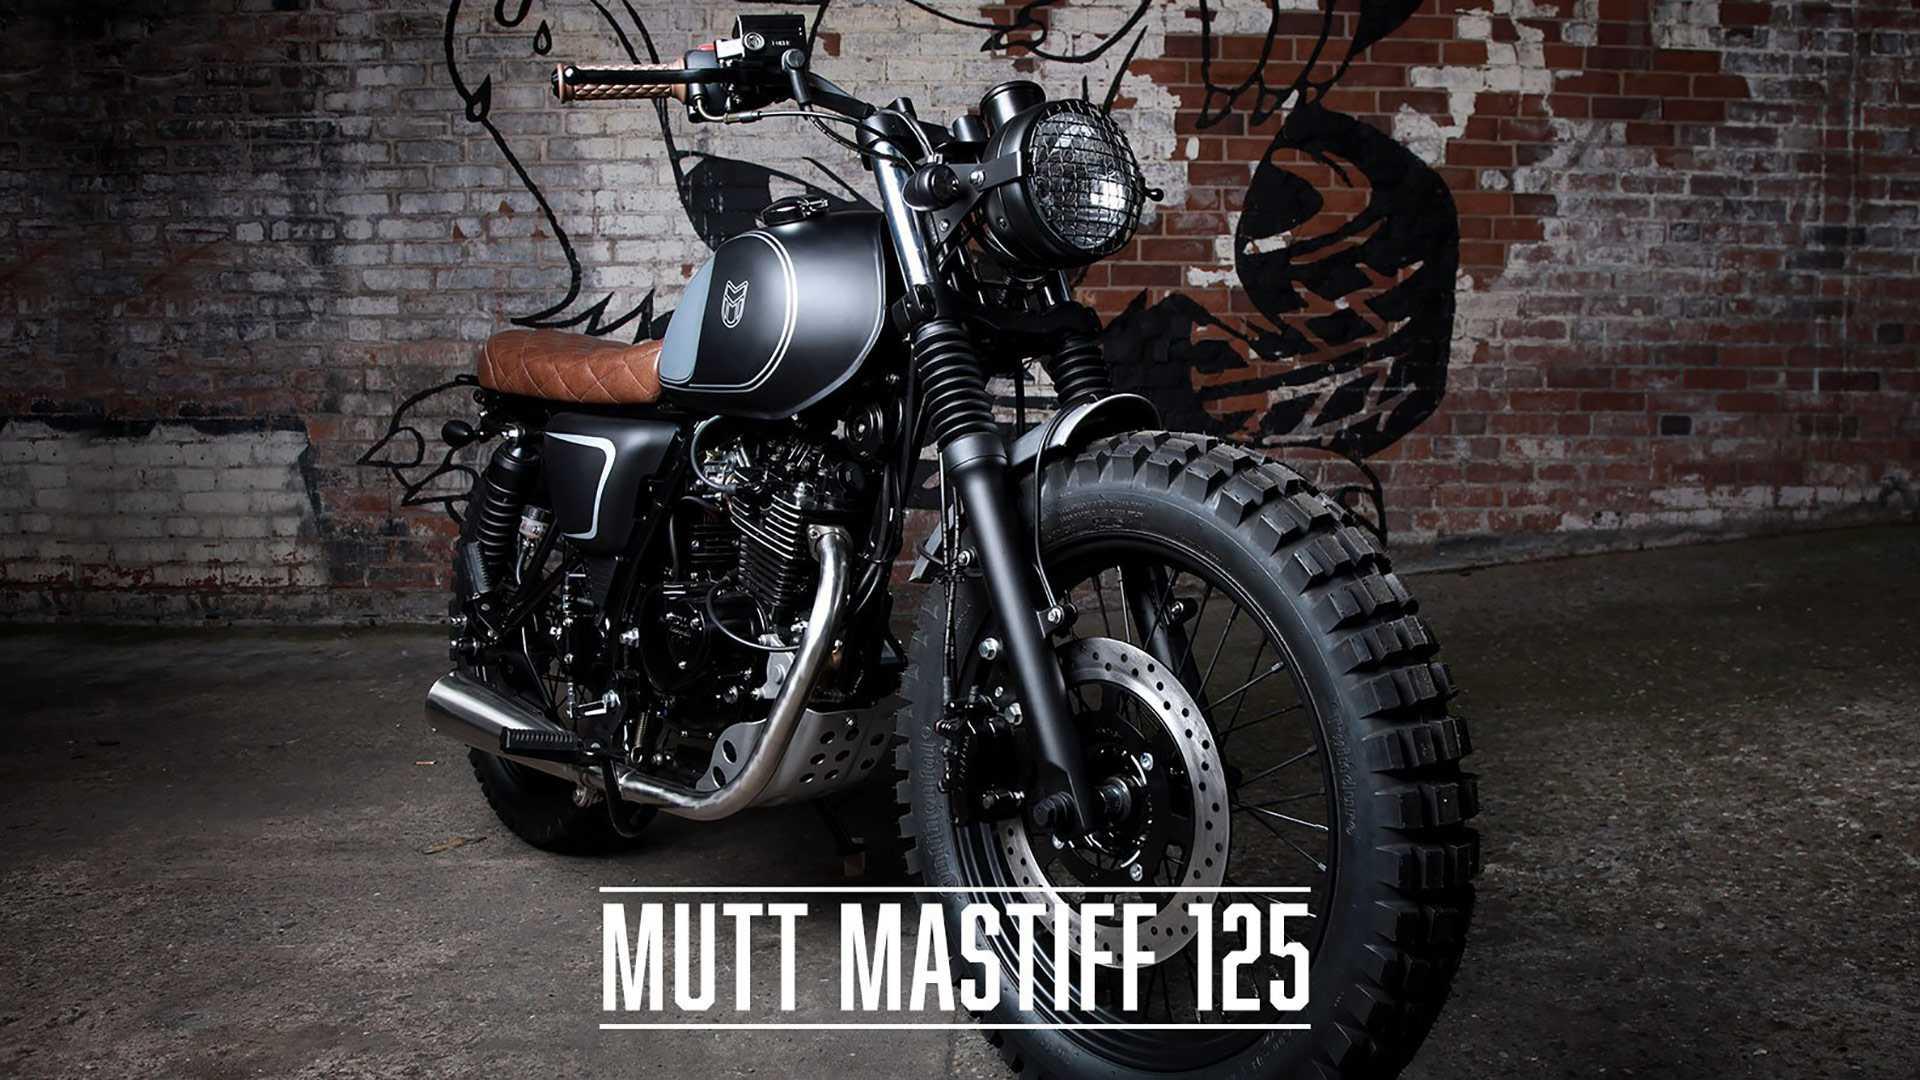 mutt-mastiff-125-9